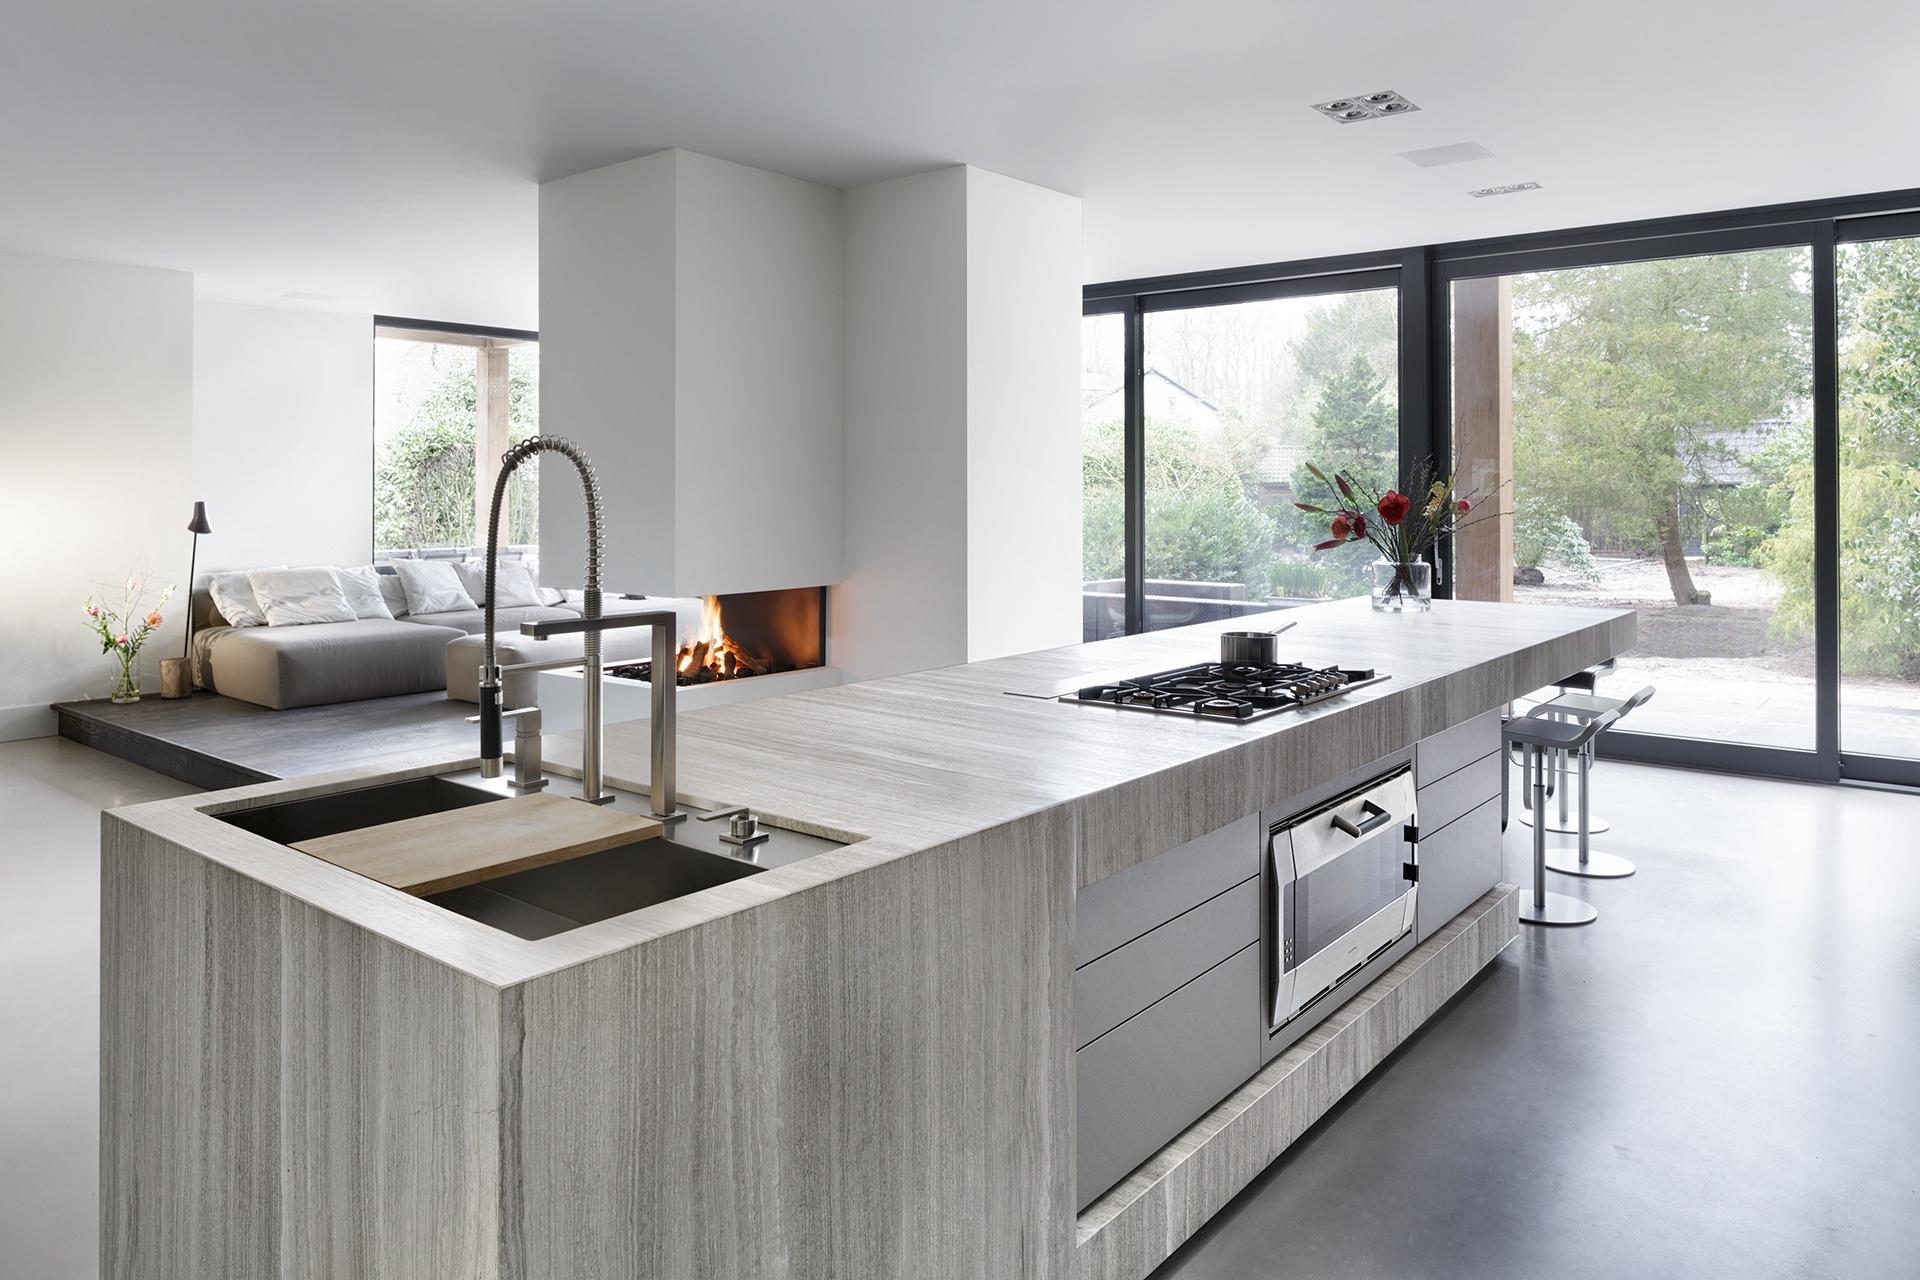 Design Keuken Merken : IQ keukens Greeploze witte keuken Eigenhuis ...